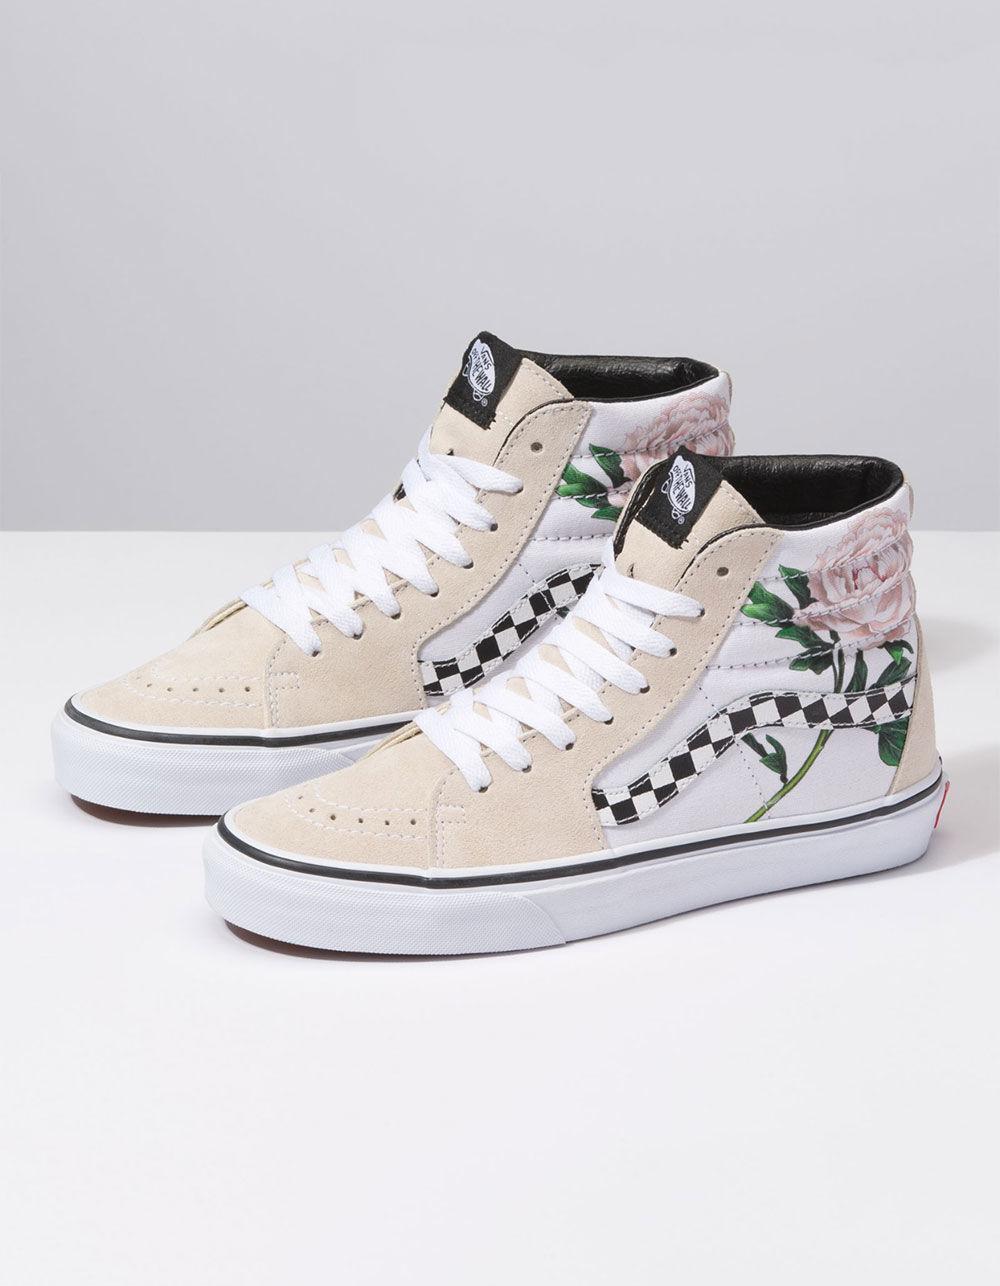 b744ae86896 Lyst - Vans Sk8-hi Checker Floral Womens Shoes